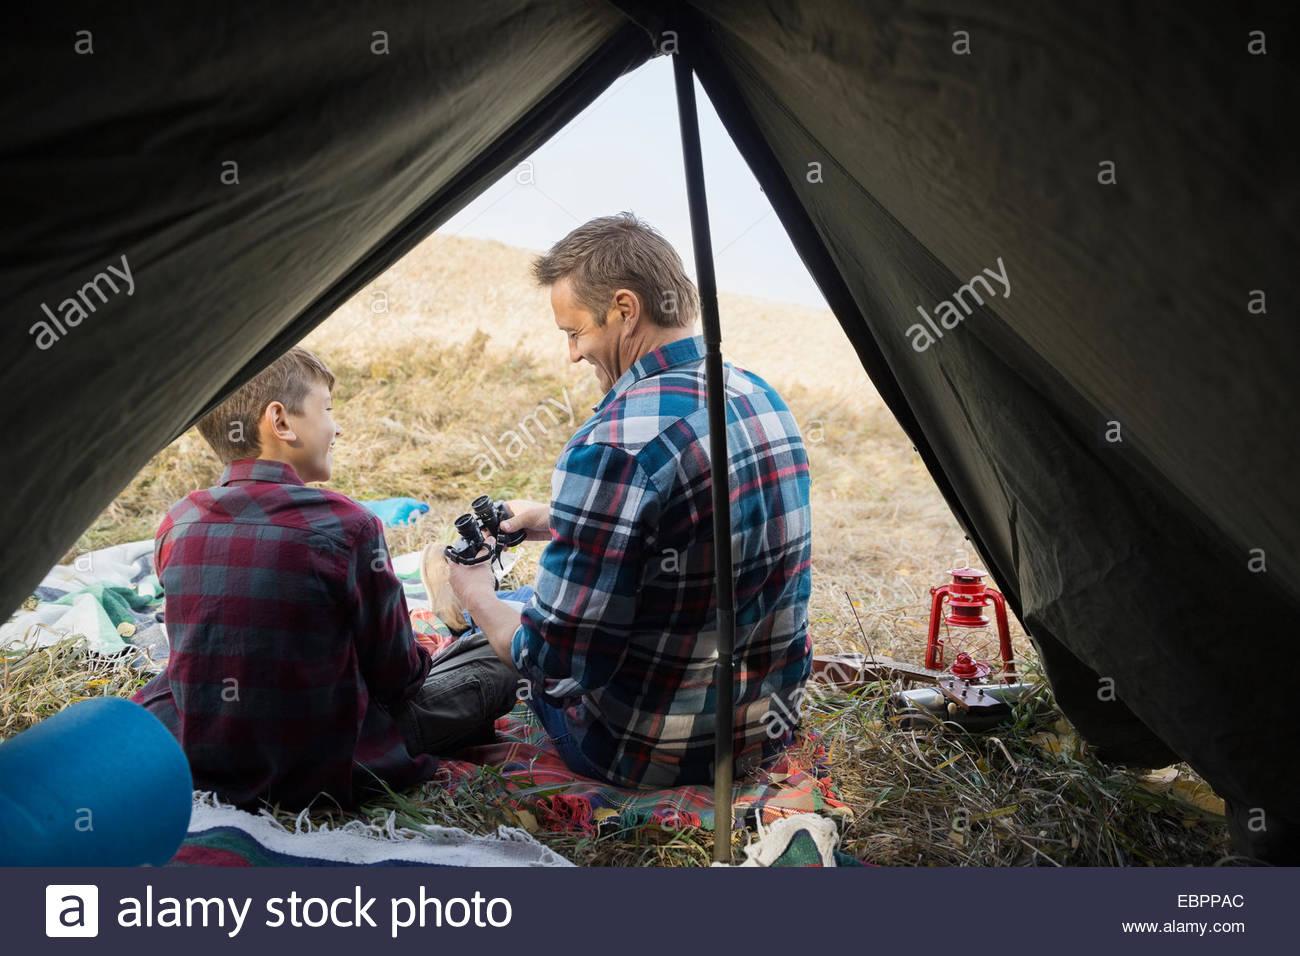 Vater und Sohn mit dem Fernglas vor Zelt Stockbild